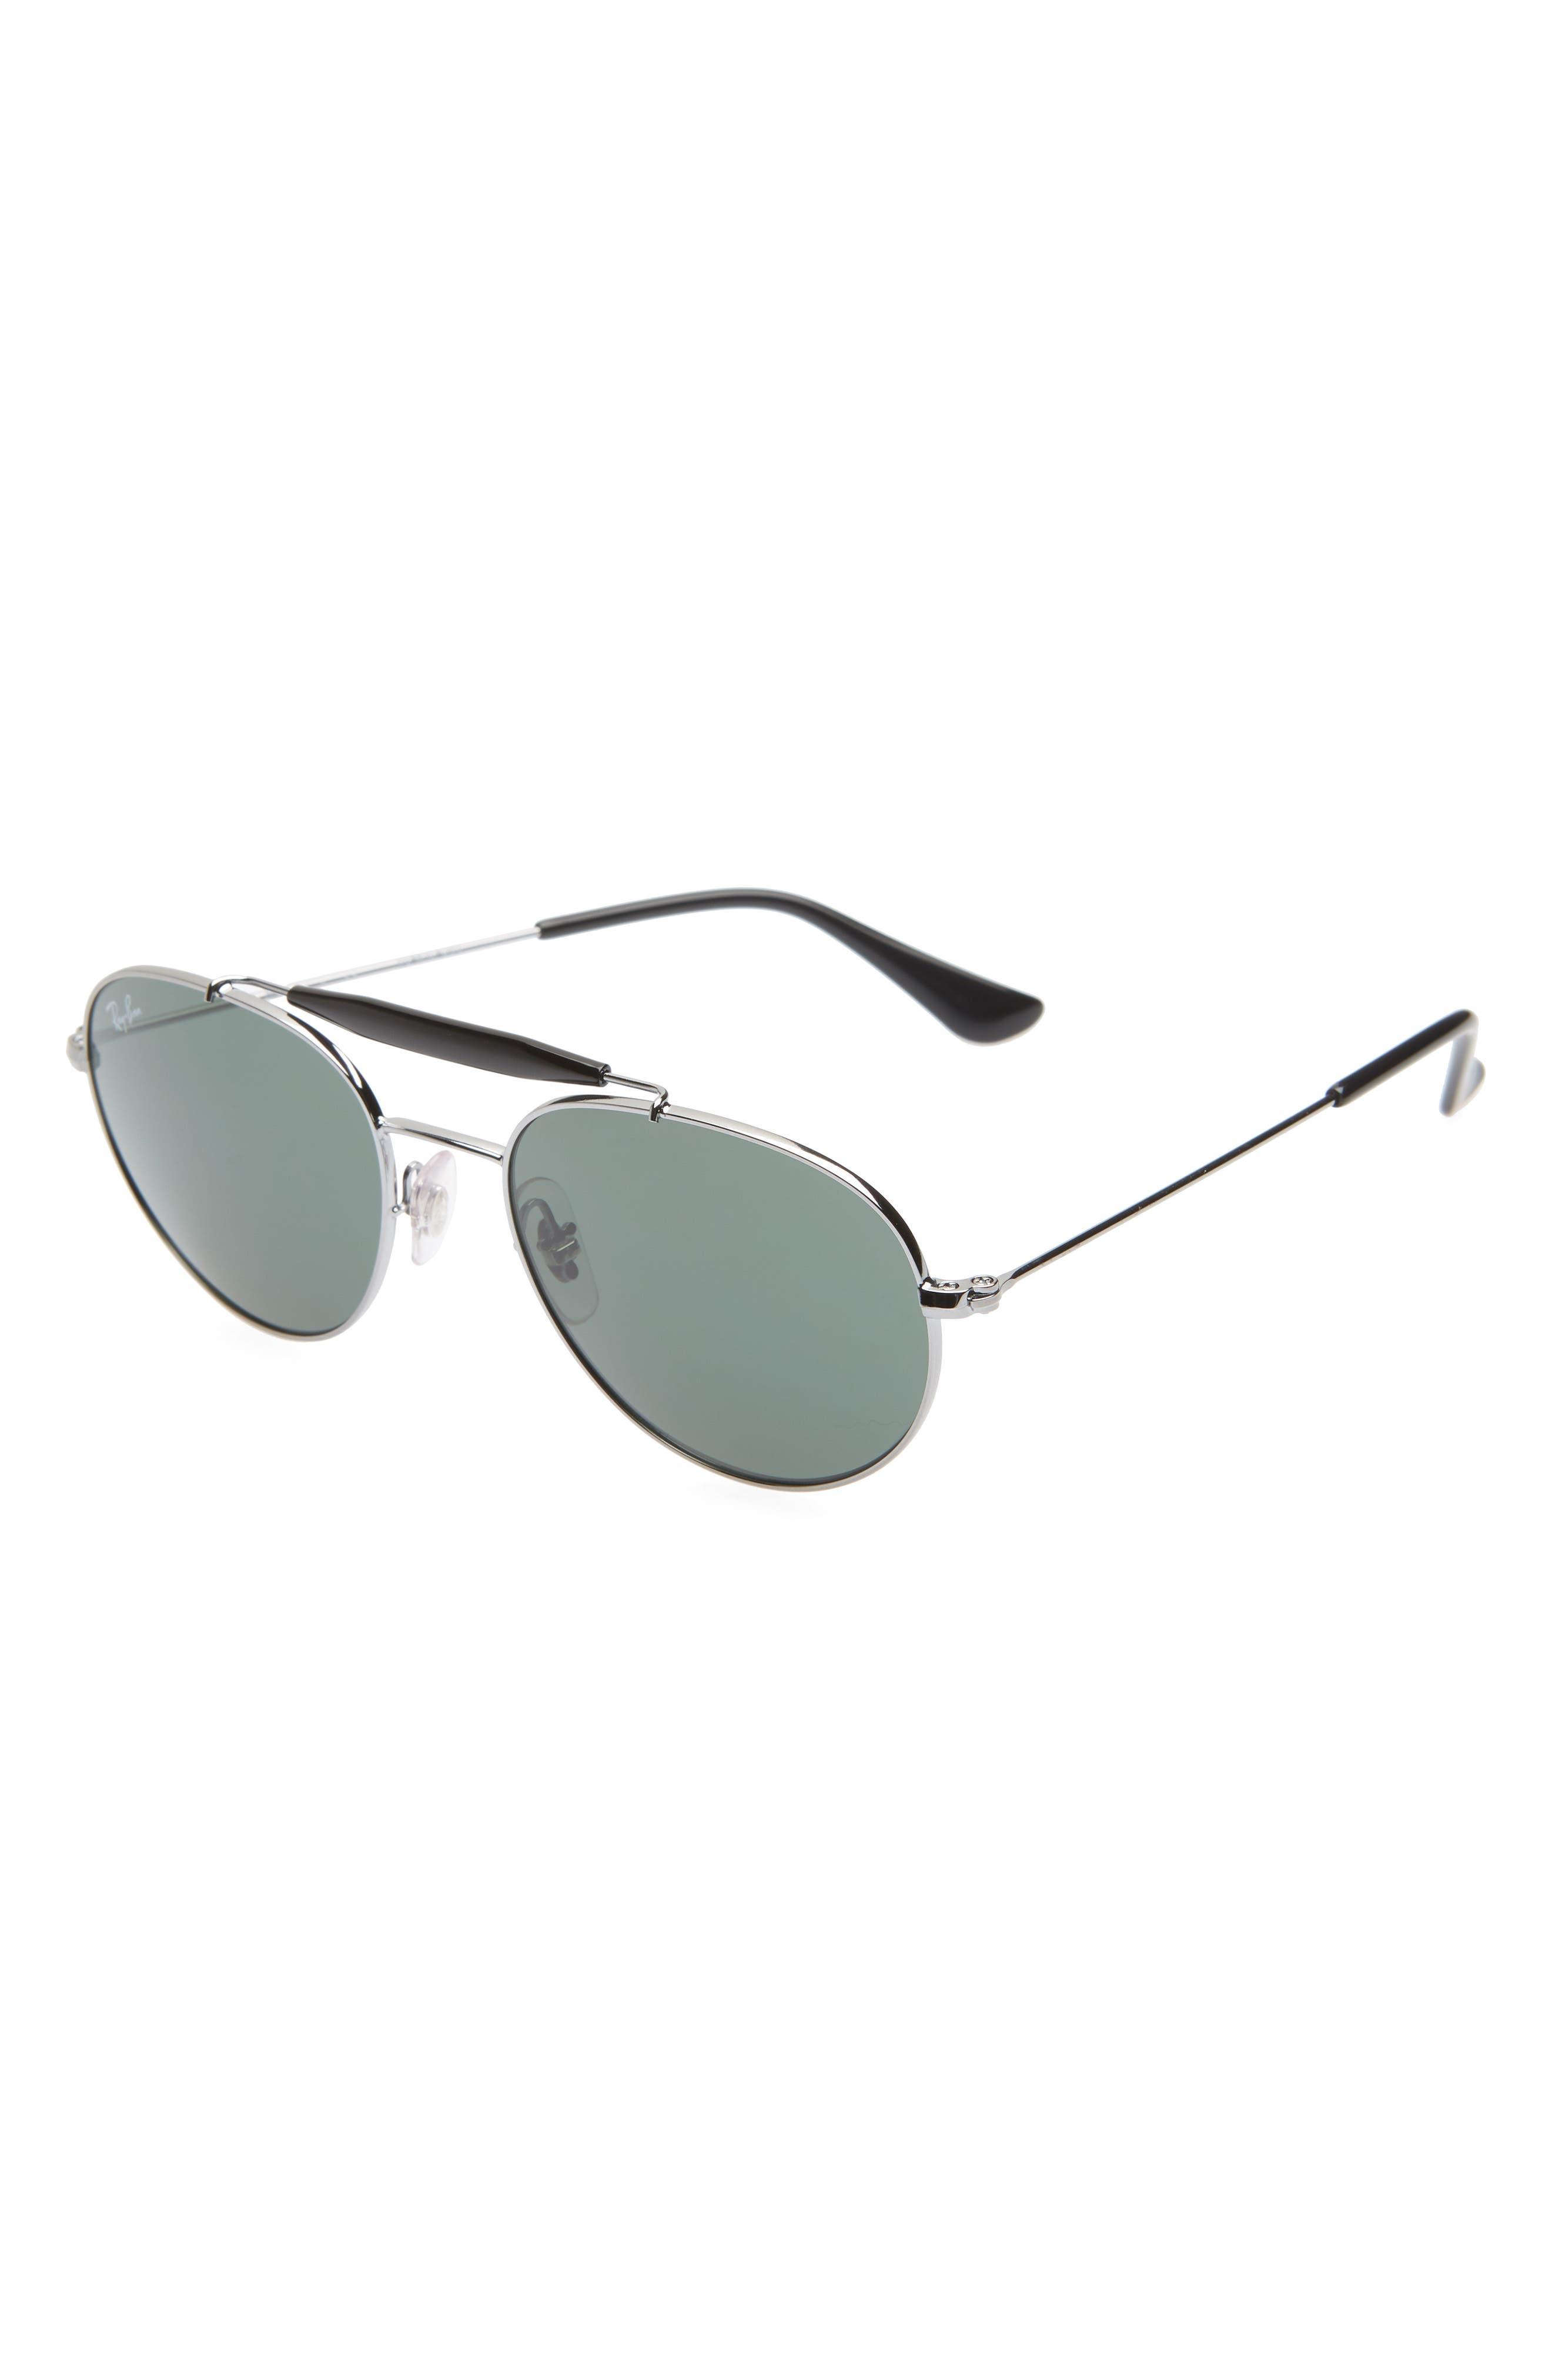 Ray-Ban Junior 50Mm Aviator Sunglasses - Gunmental/ Grey Solid